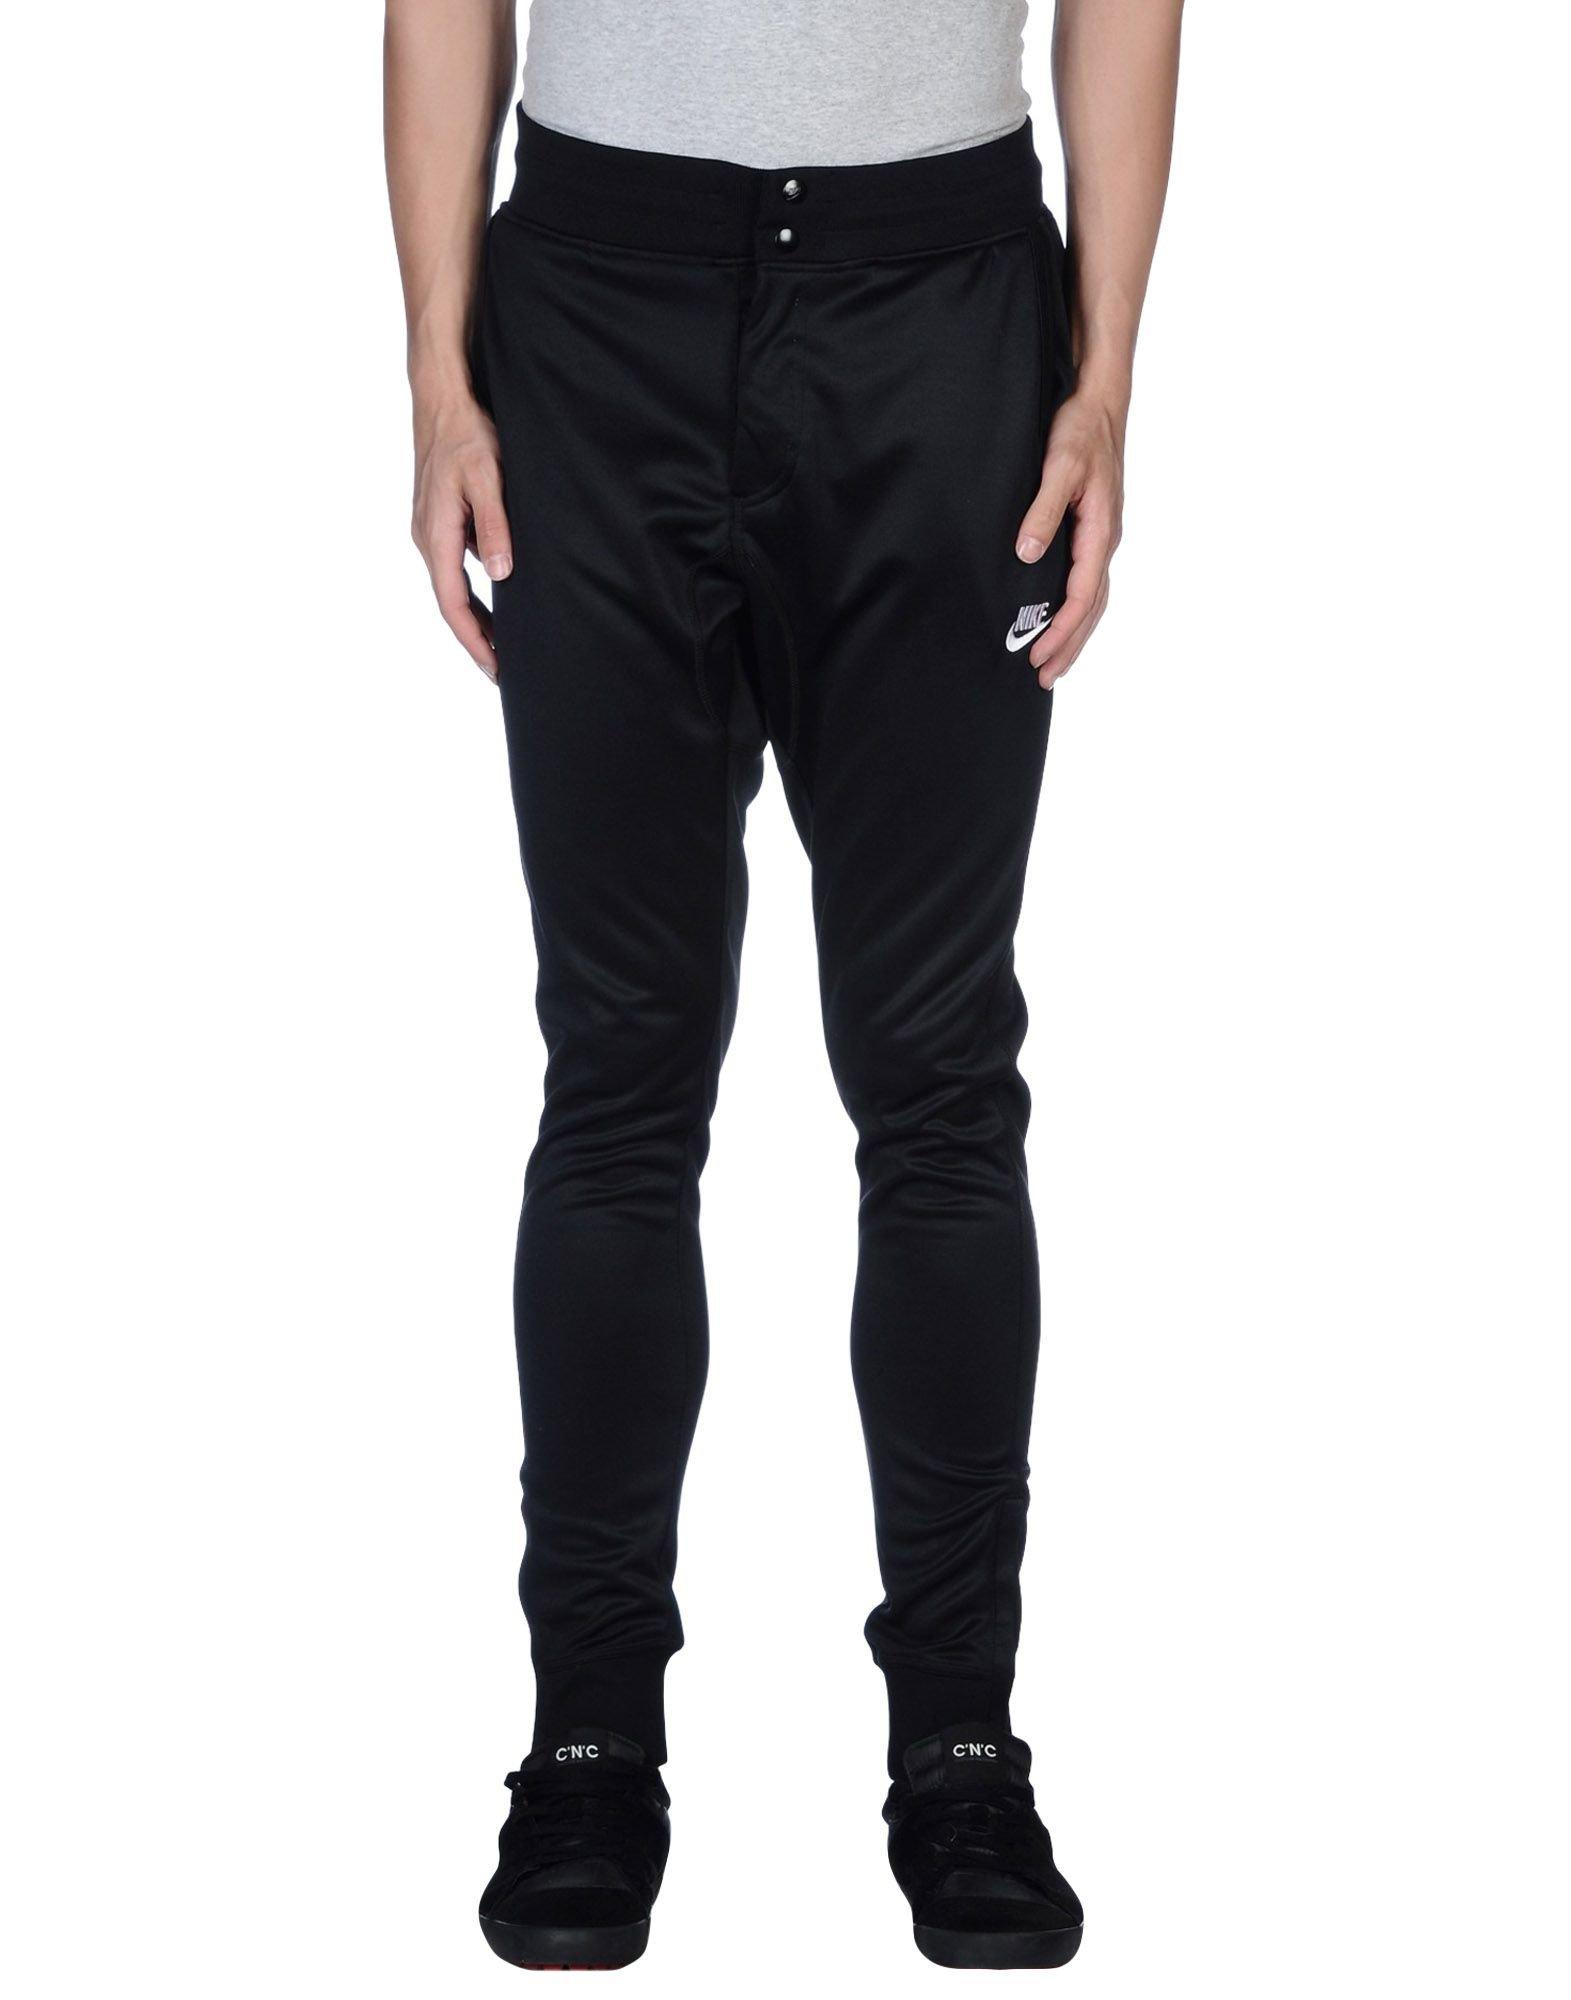 Lyst - Nike Casual Trouser in Black for Men